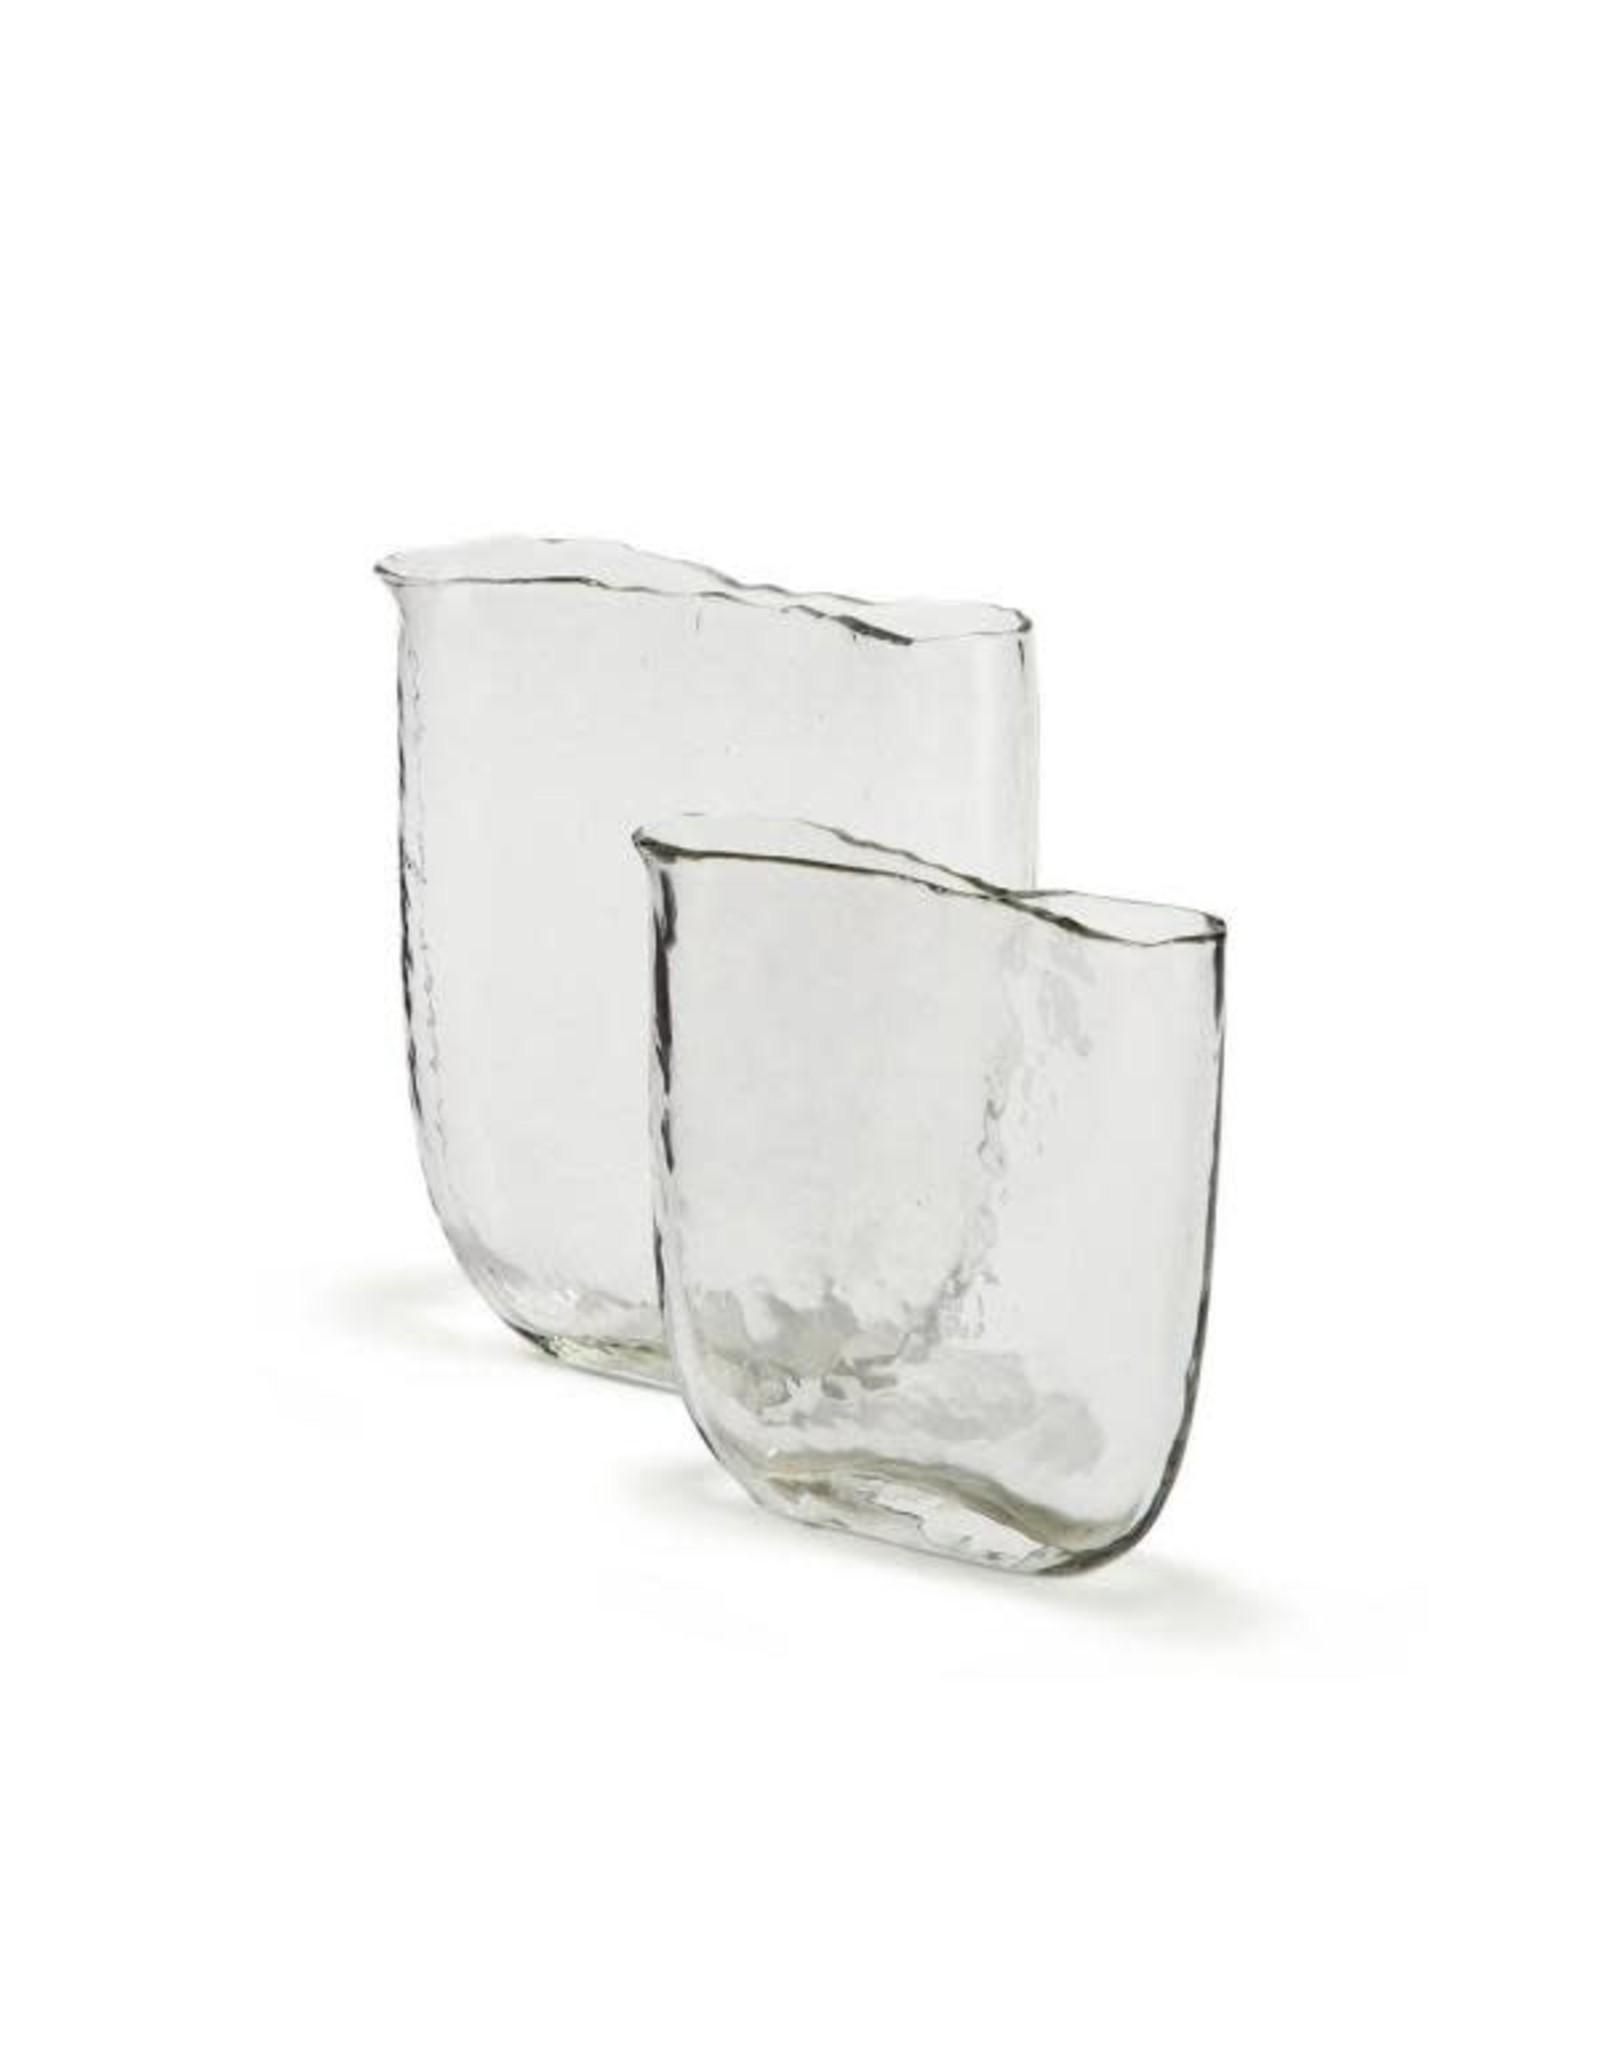 Oak + Arrow Interiors Ellipse Clear Vases - Large